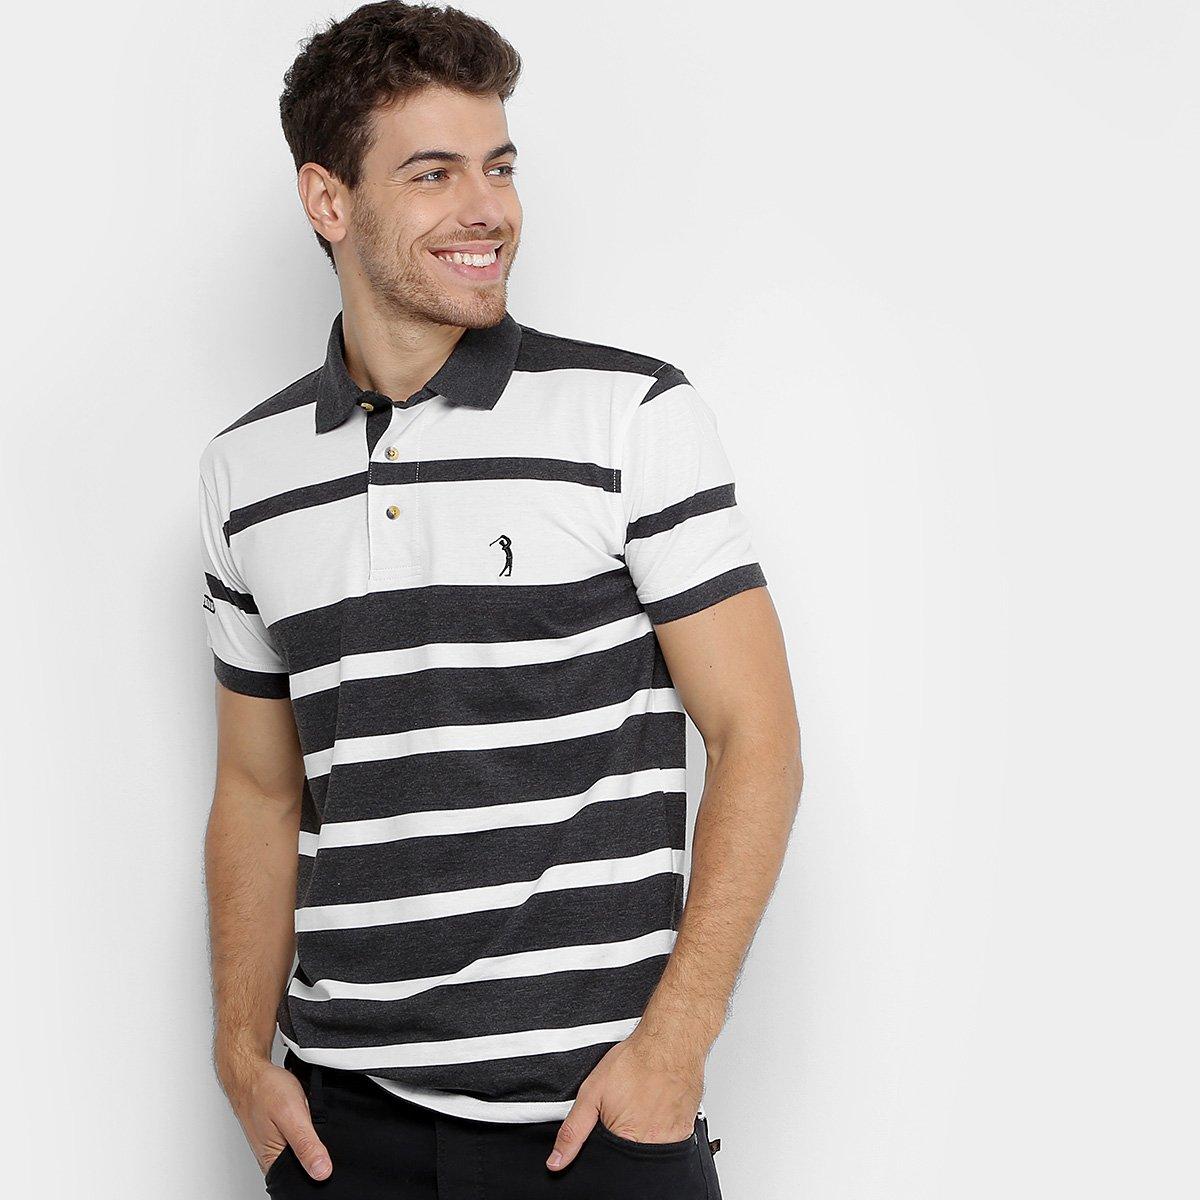 a8917b54a1 Camisa Polo Aleatory Listras Masculina - Compre Agora